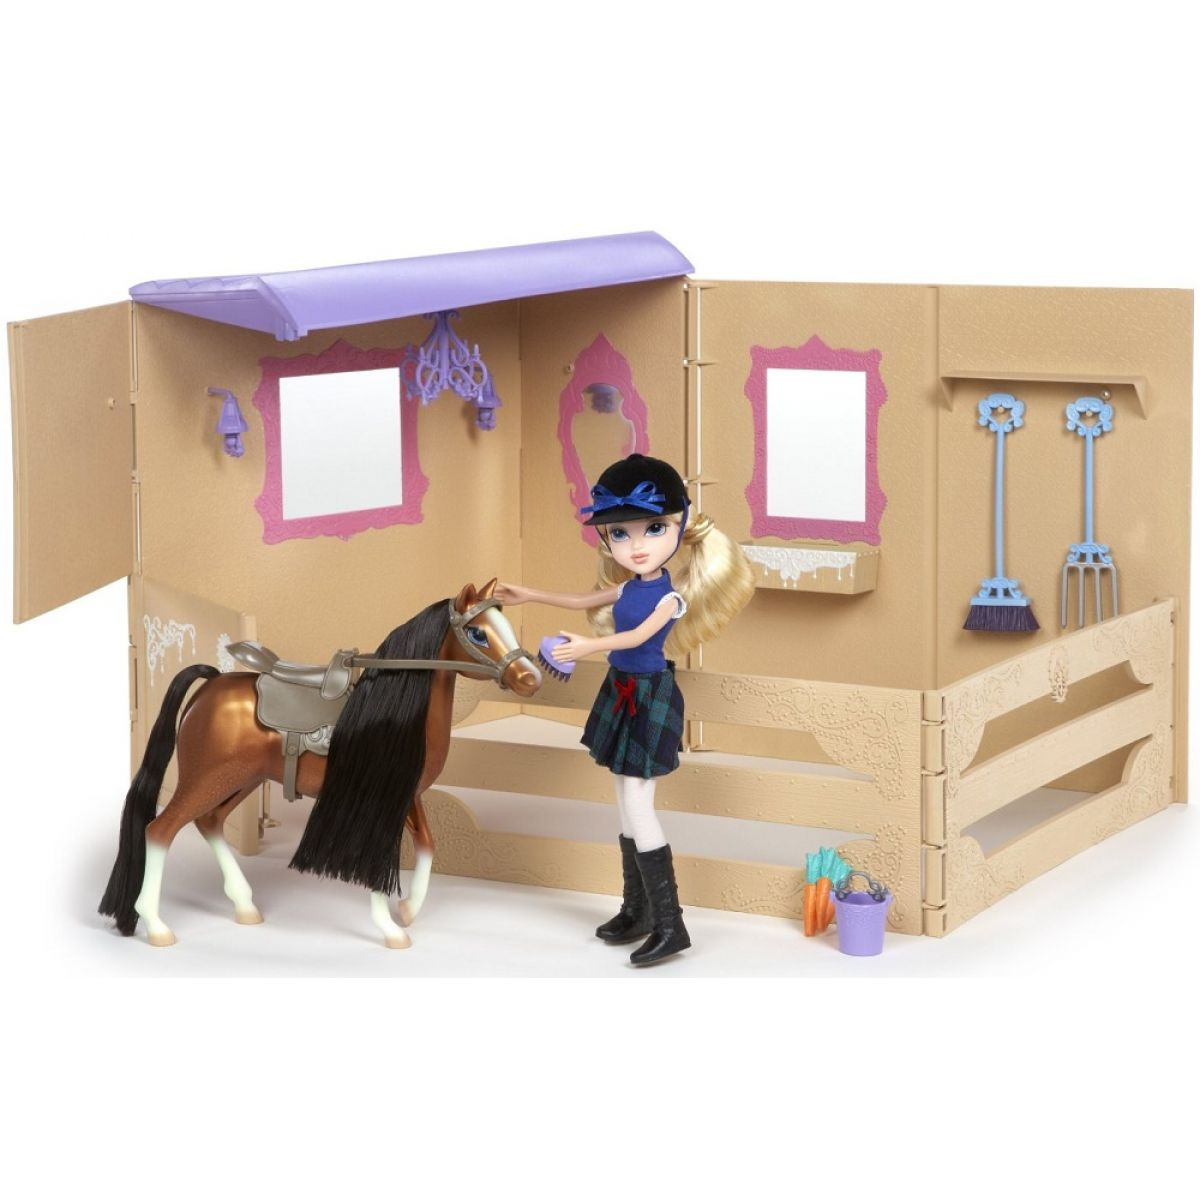 Moxie Girlz Stáj s koněm